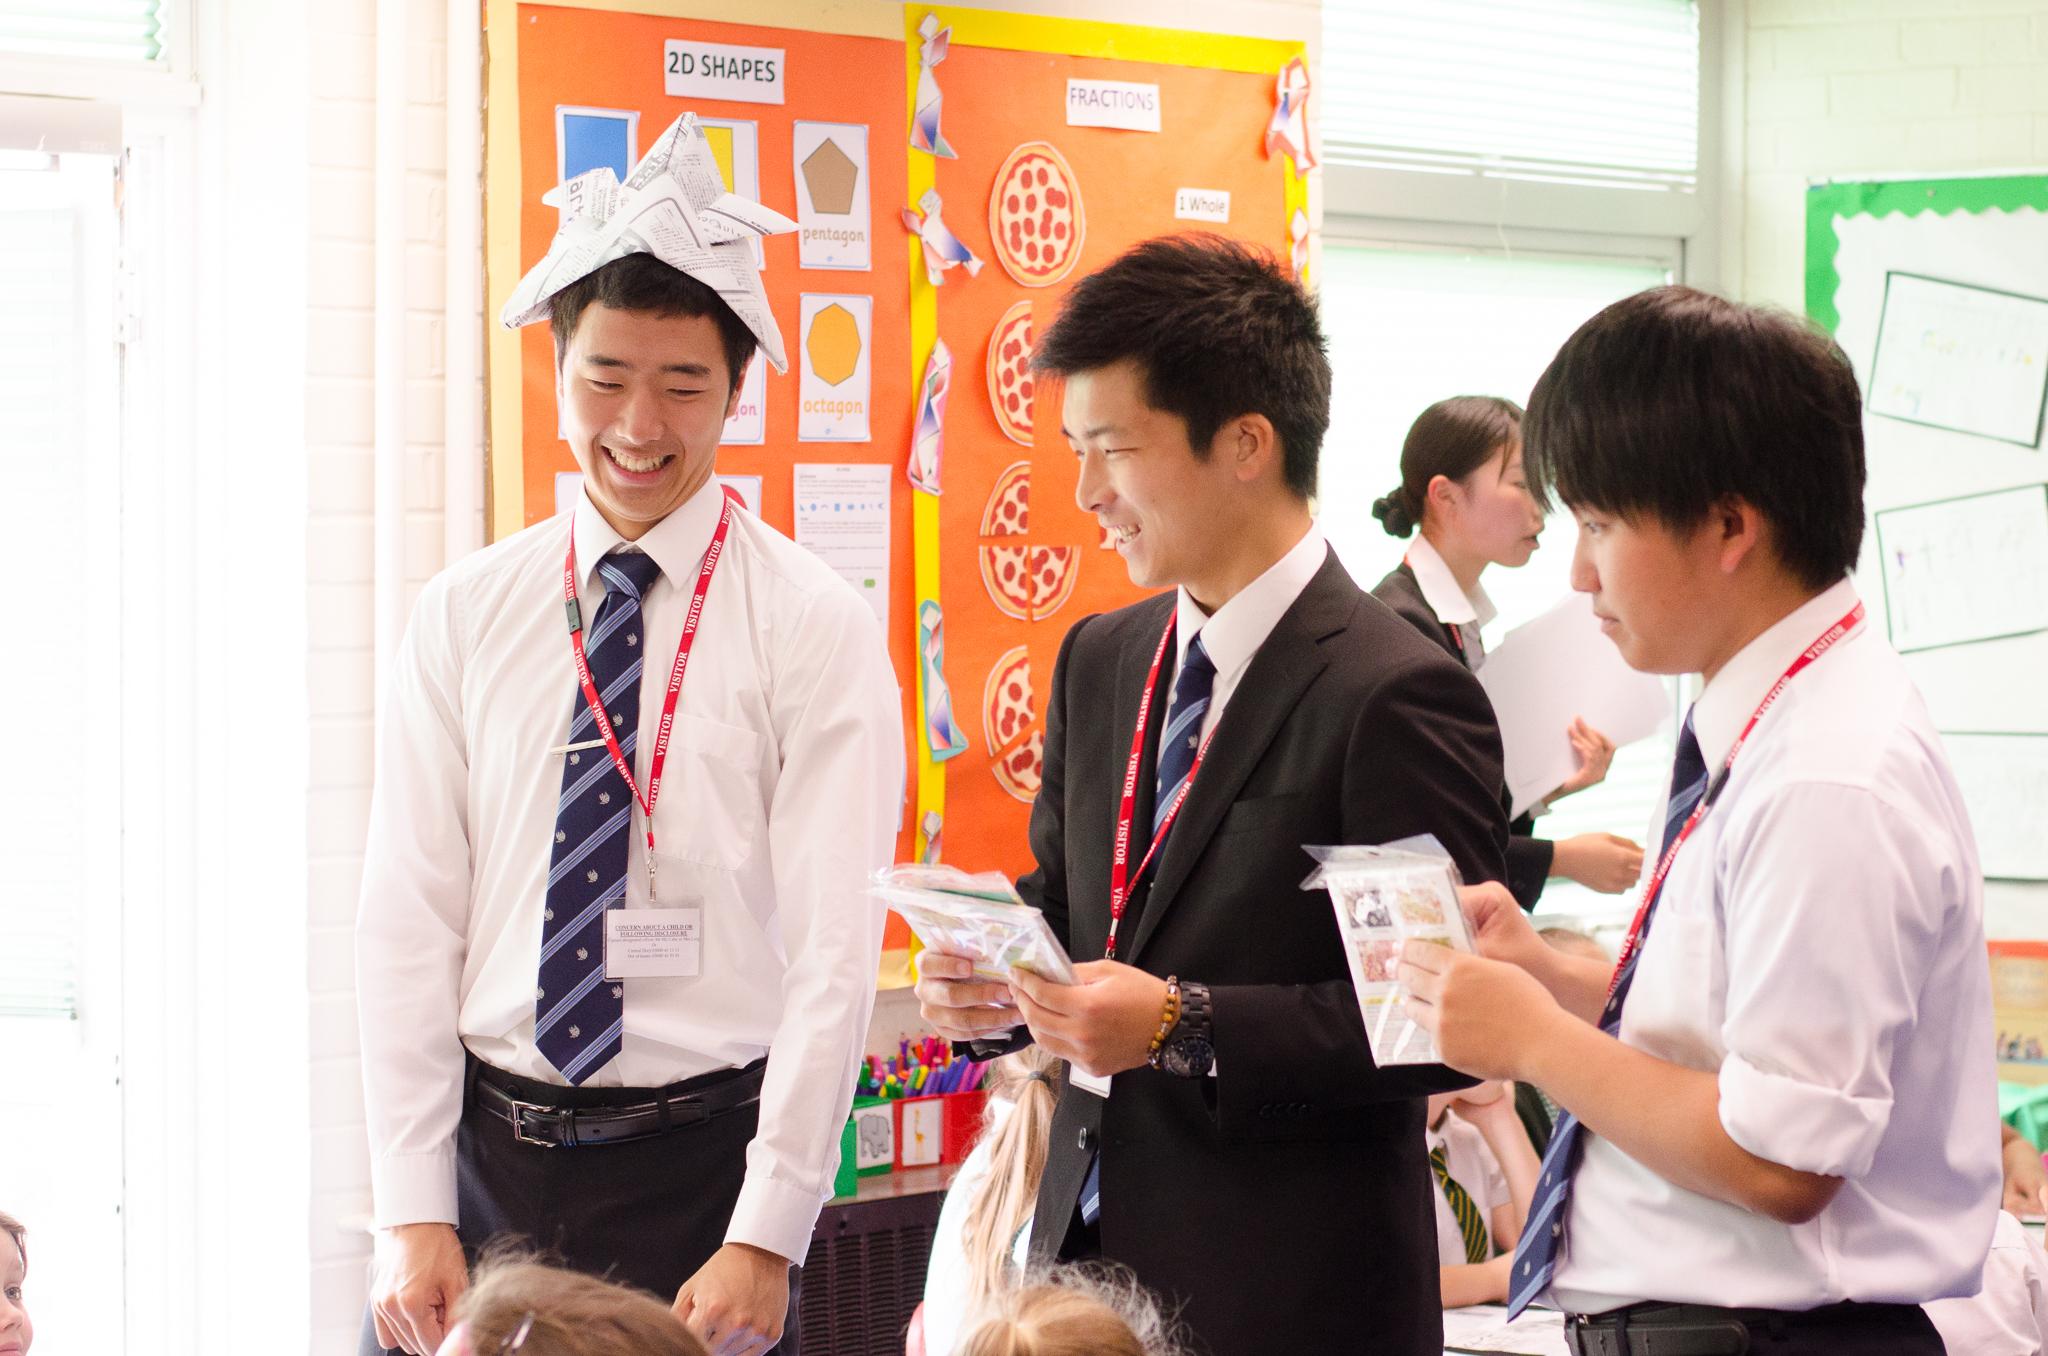 TED_School Visit Ashford-20